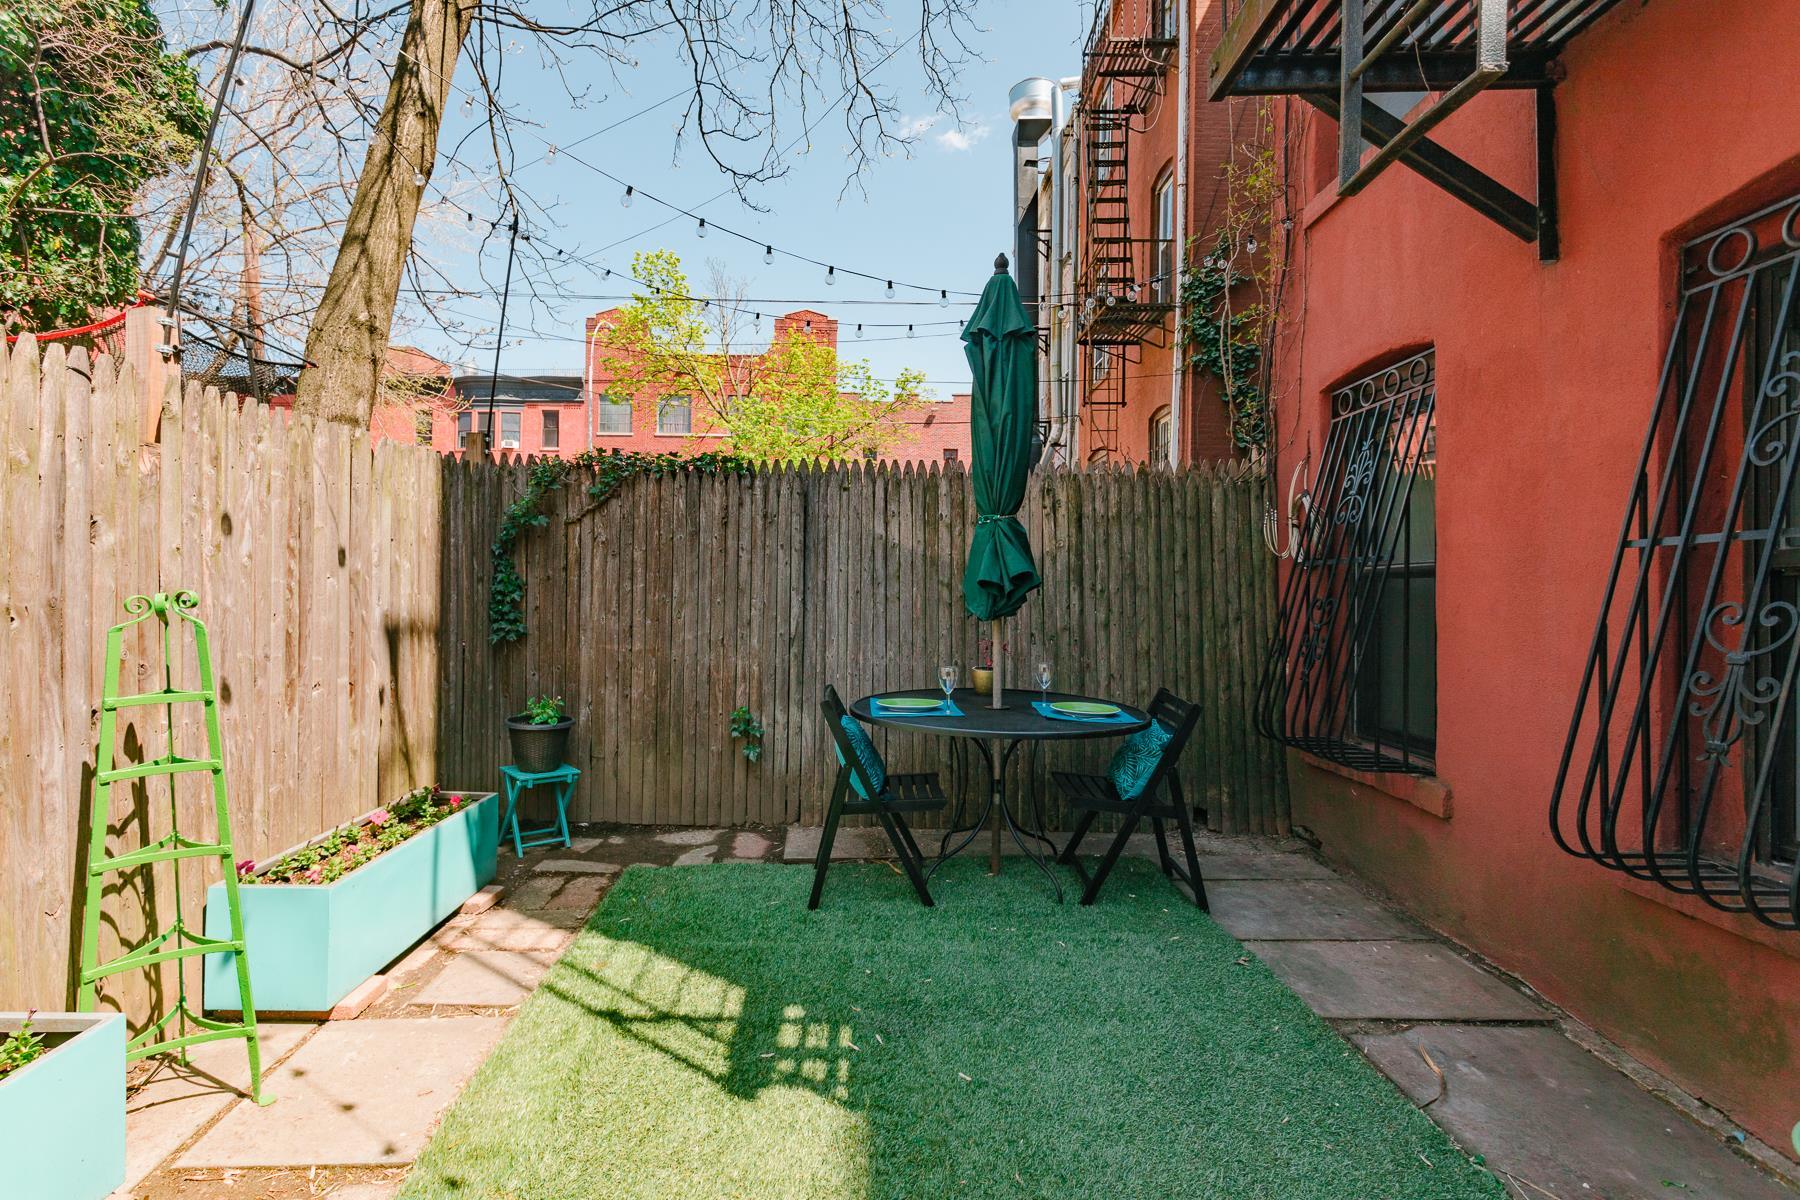 355A Halsey Street Bedford Stuyvesant Brooklyn NY 11216